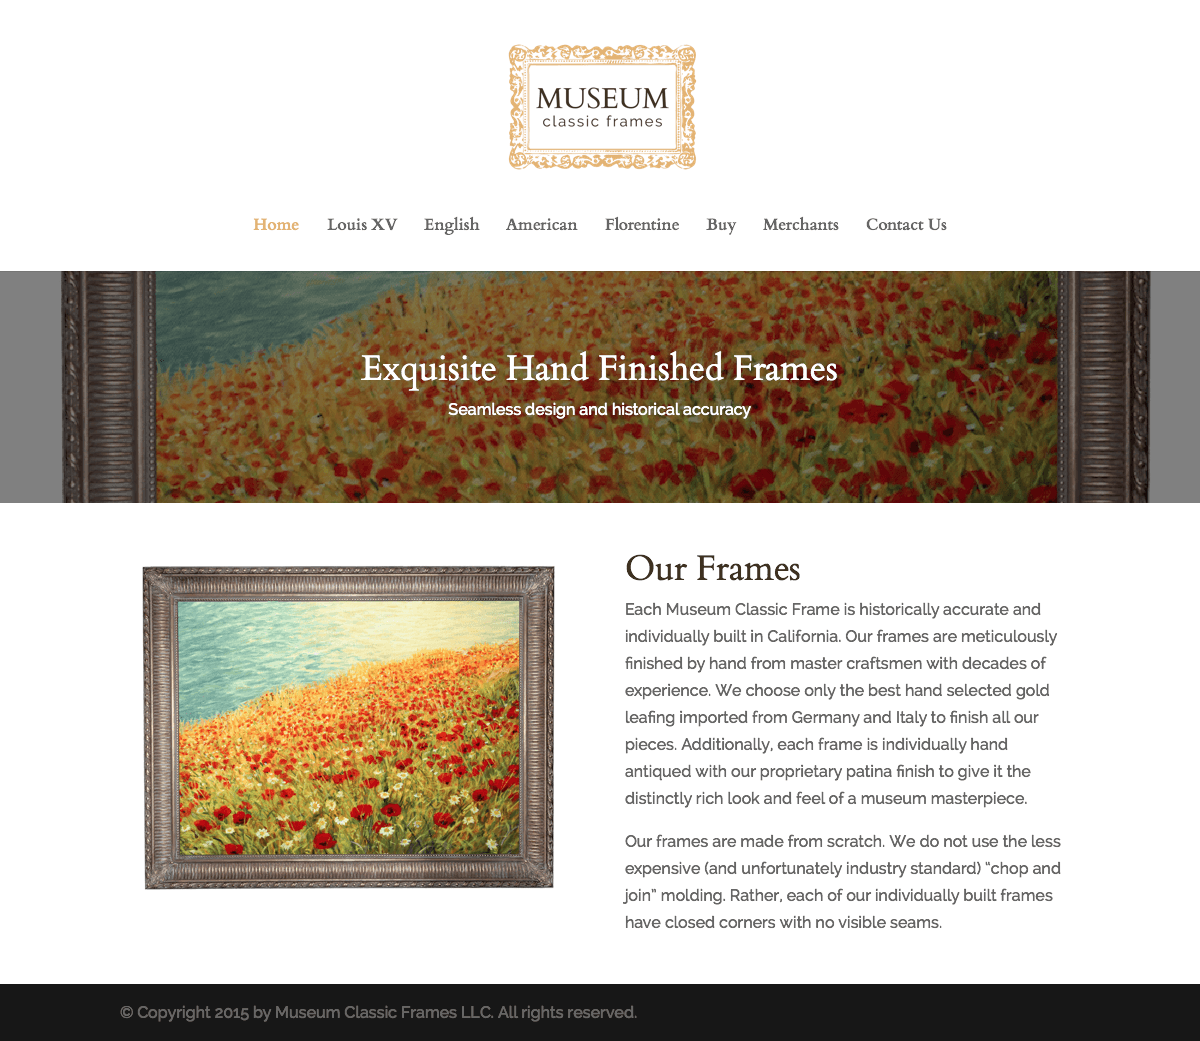 Museum Classic Frames Website